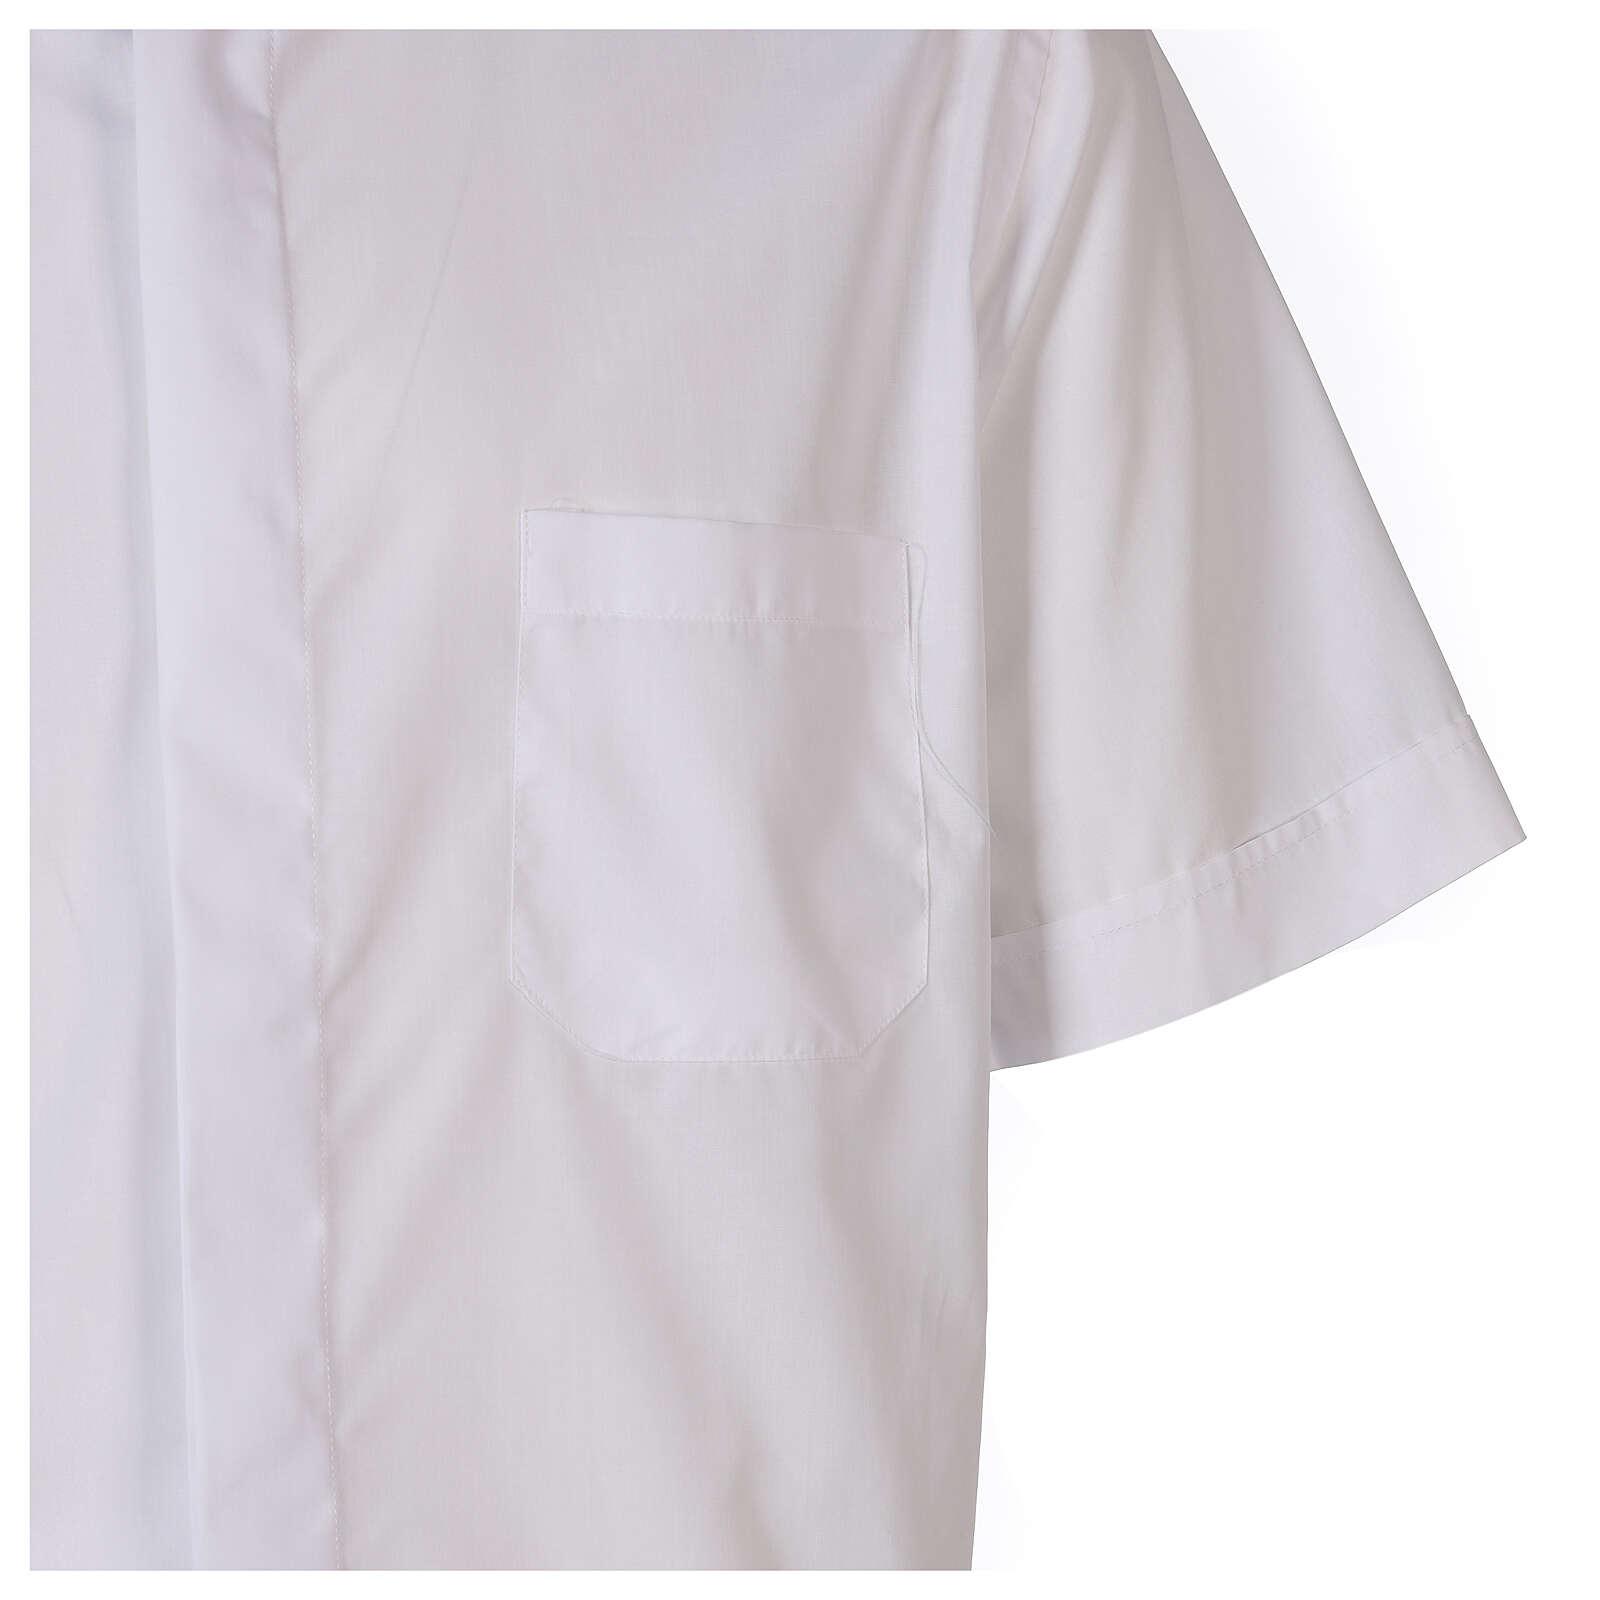 Camicia clergyman bianco tinta unita manica corta 4